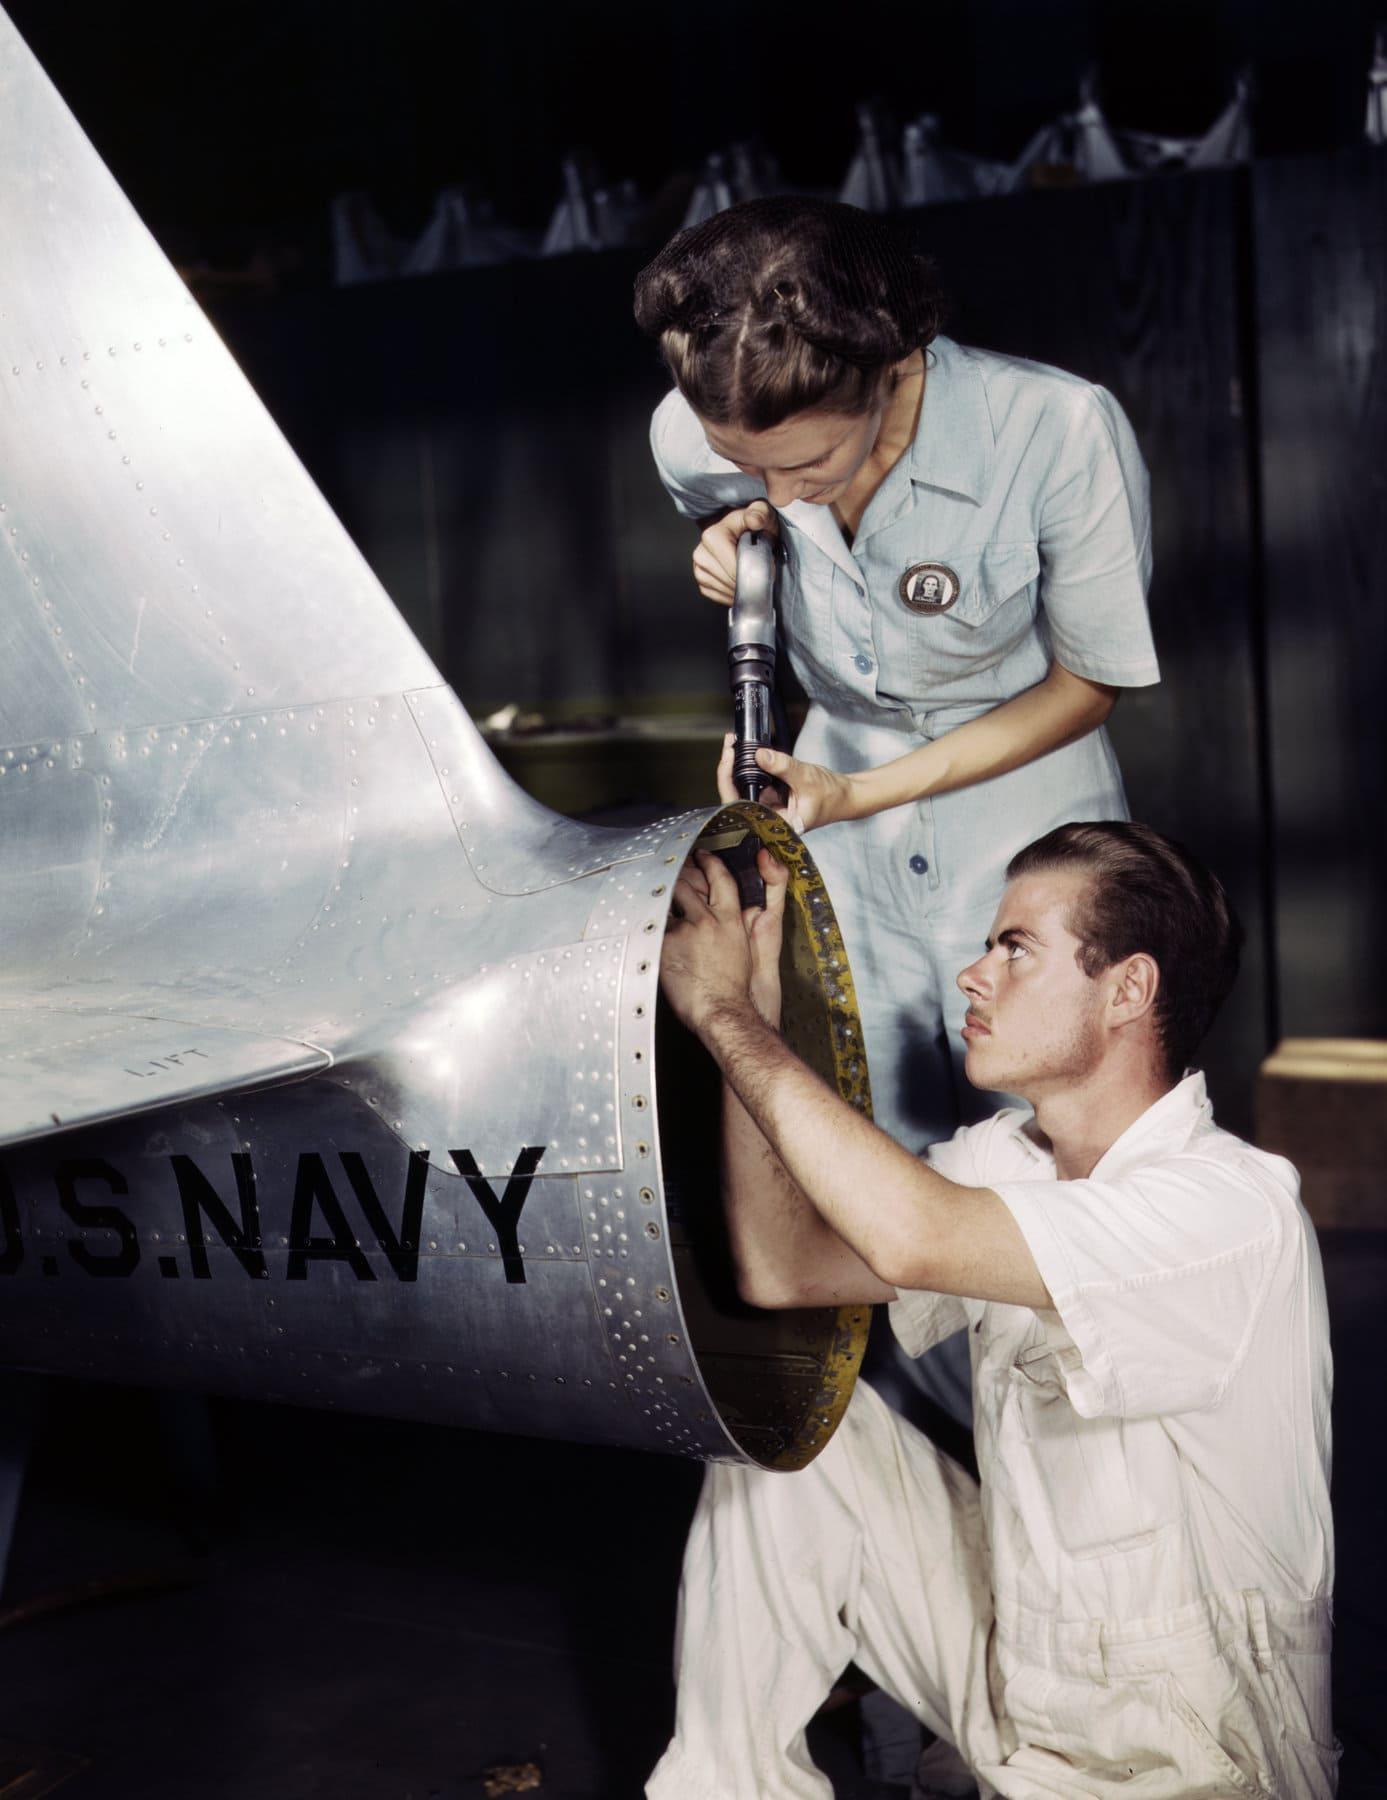 Navy assembly and repair department riveter